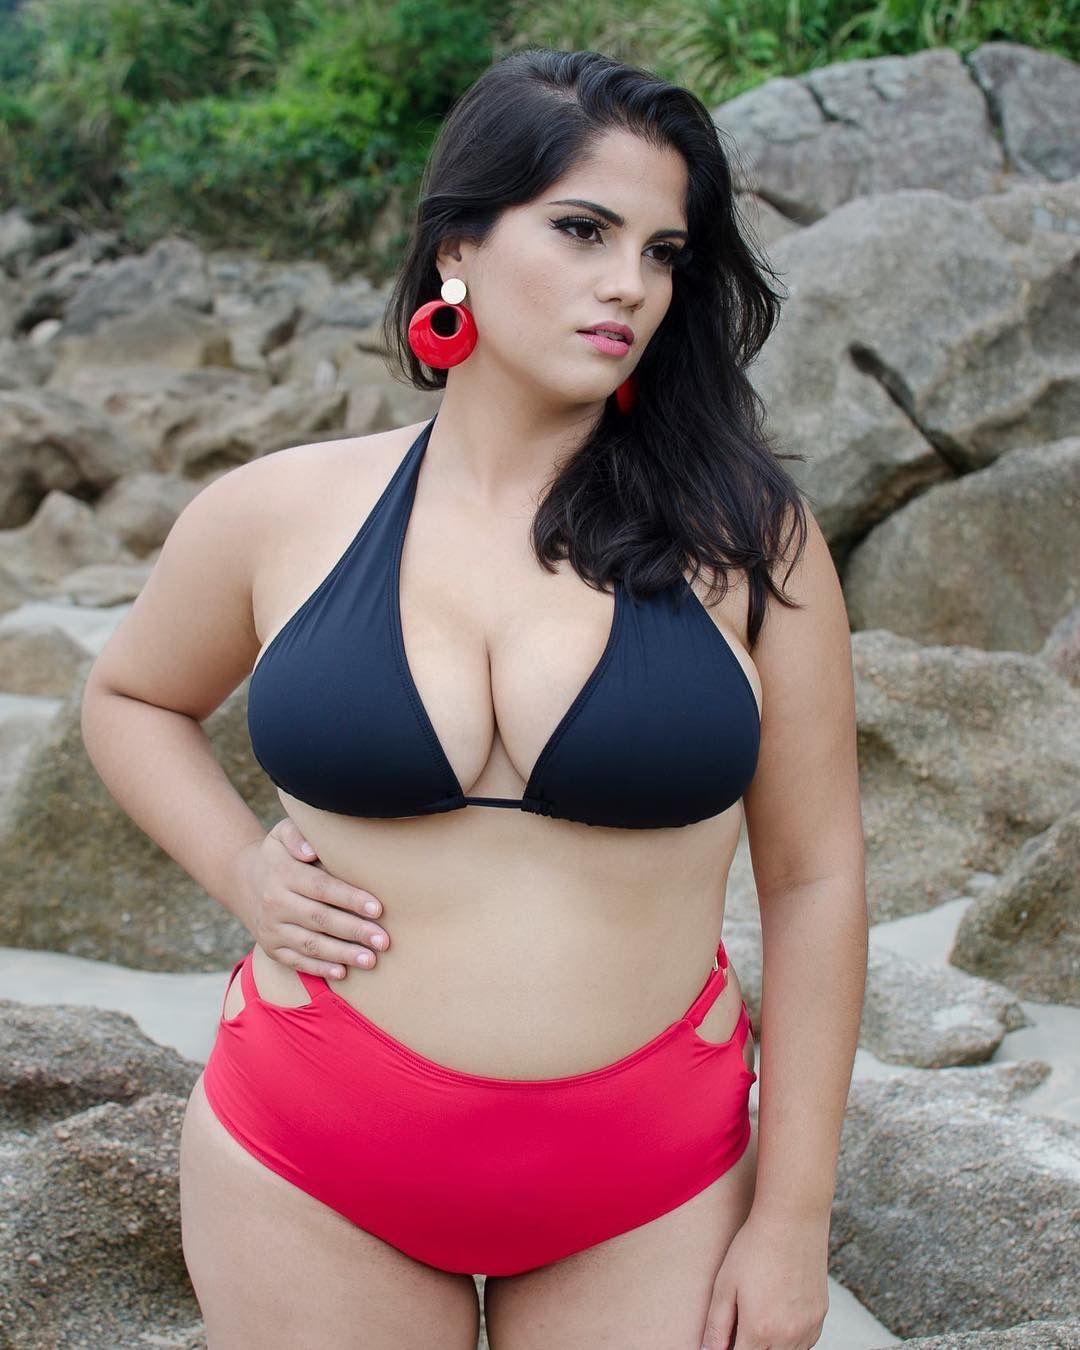 Chubby latinas in bikinis directly. sorry